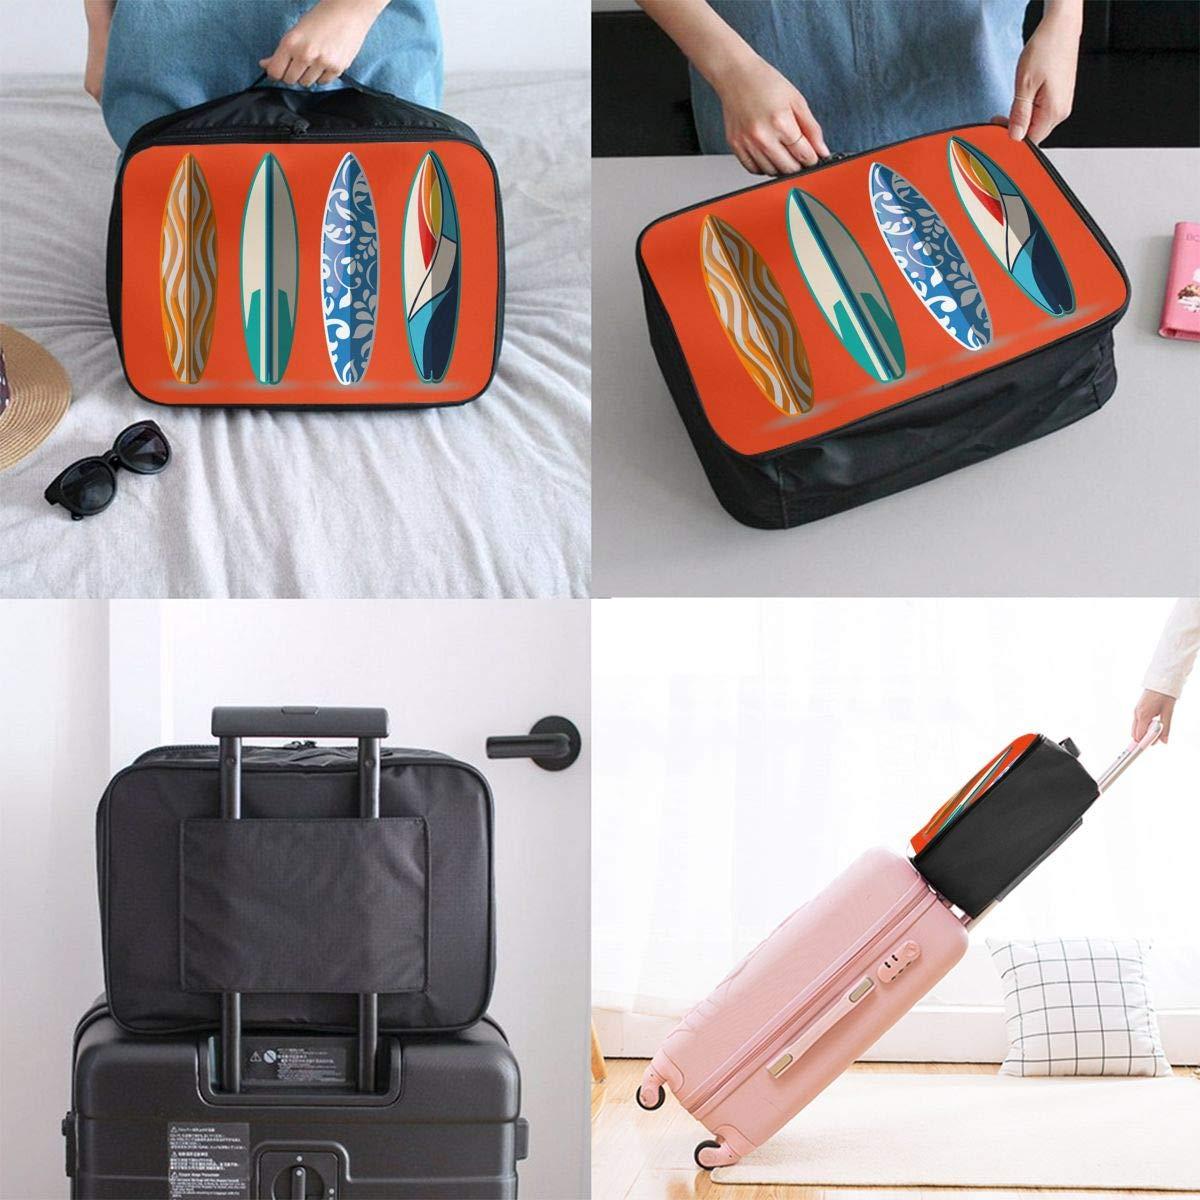 Travel Luggage Duffle Bag Lightweight Portable Handbag Surf Board Large Capacity Waterproof Foldable Storage Tote